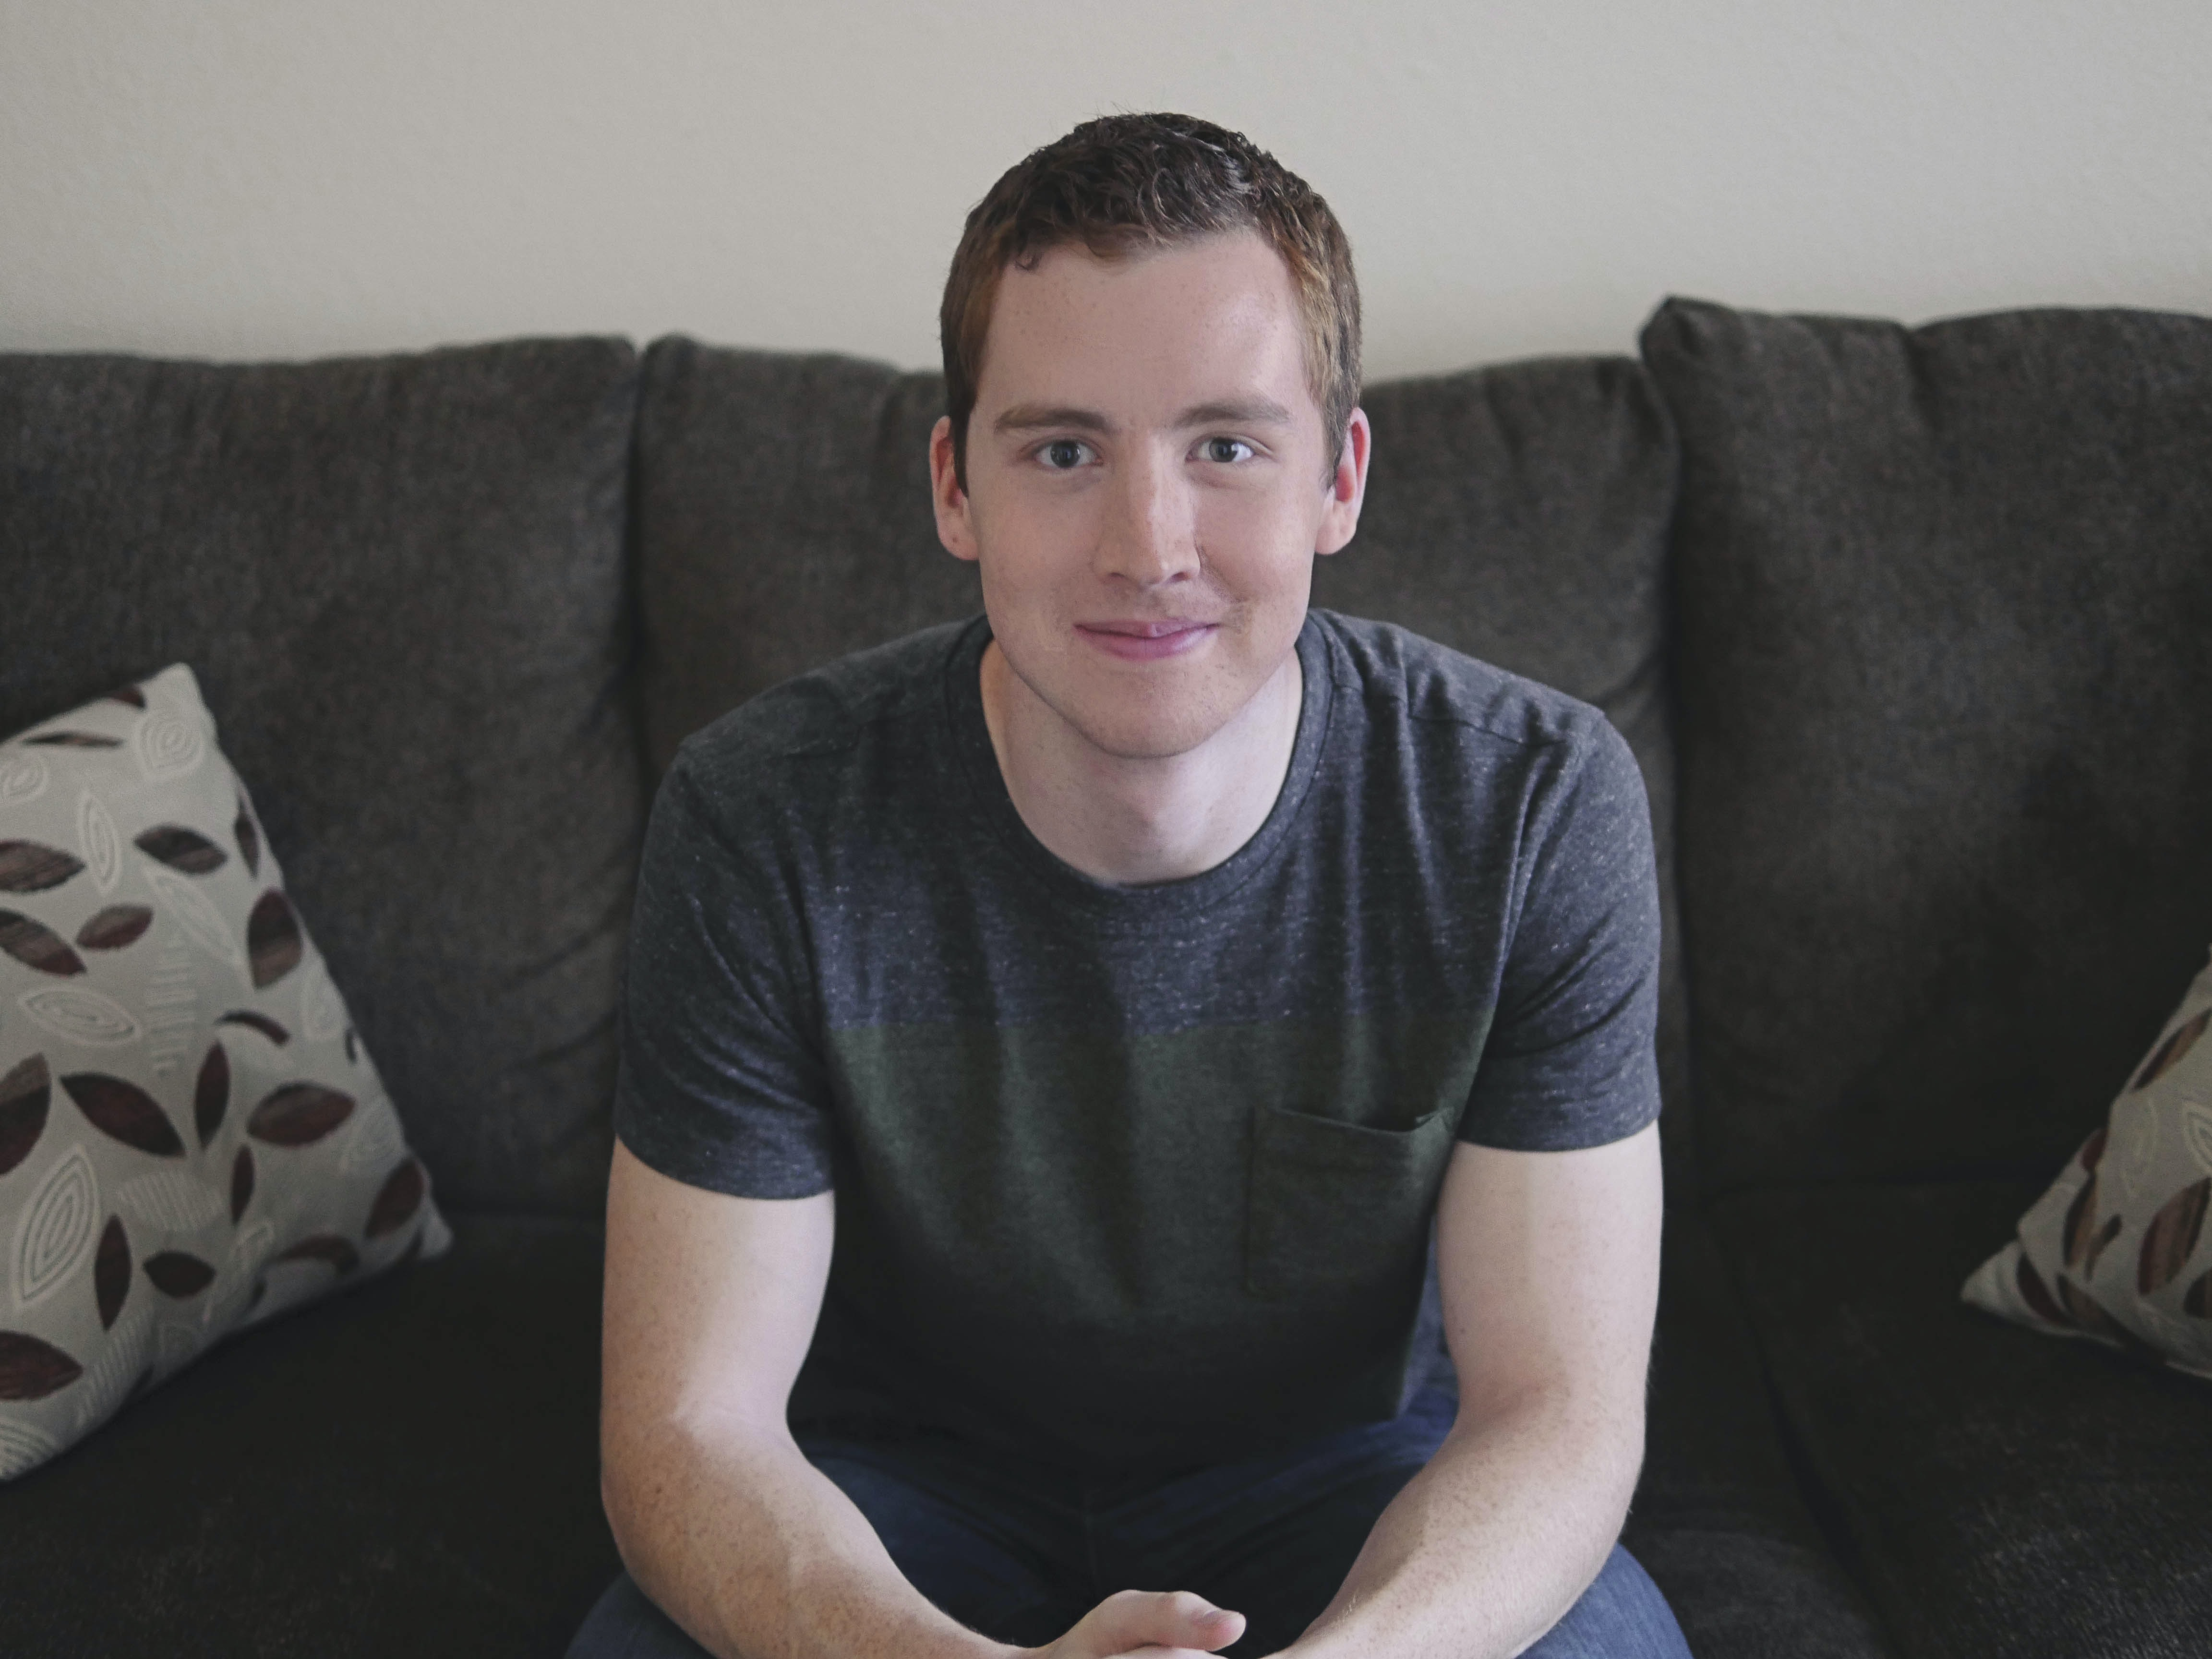 Go to Matthew Osborn's profile